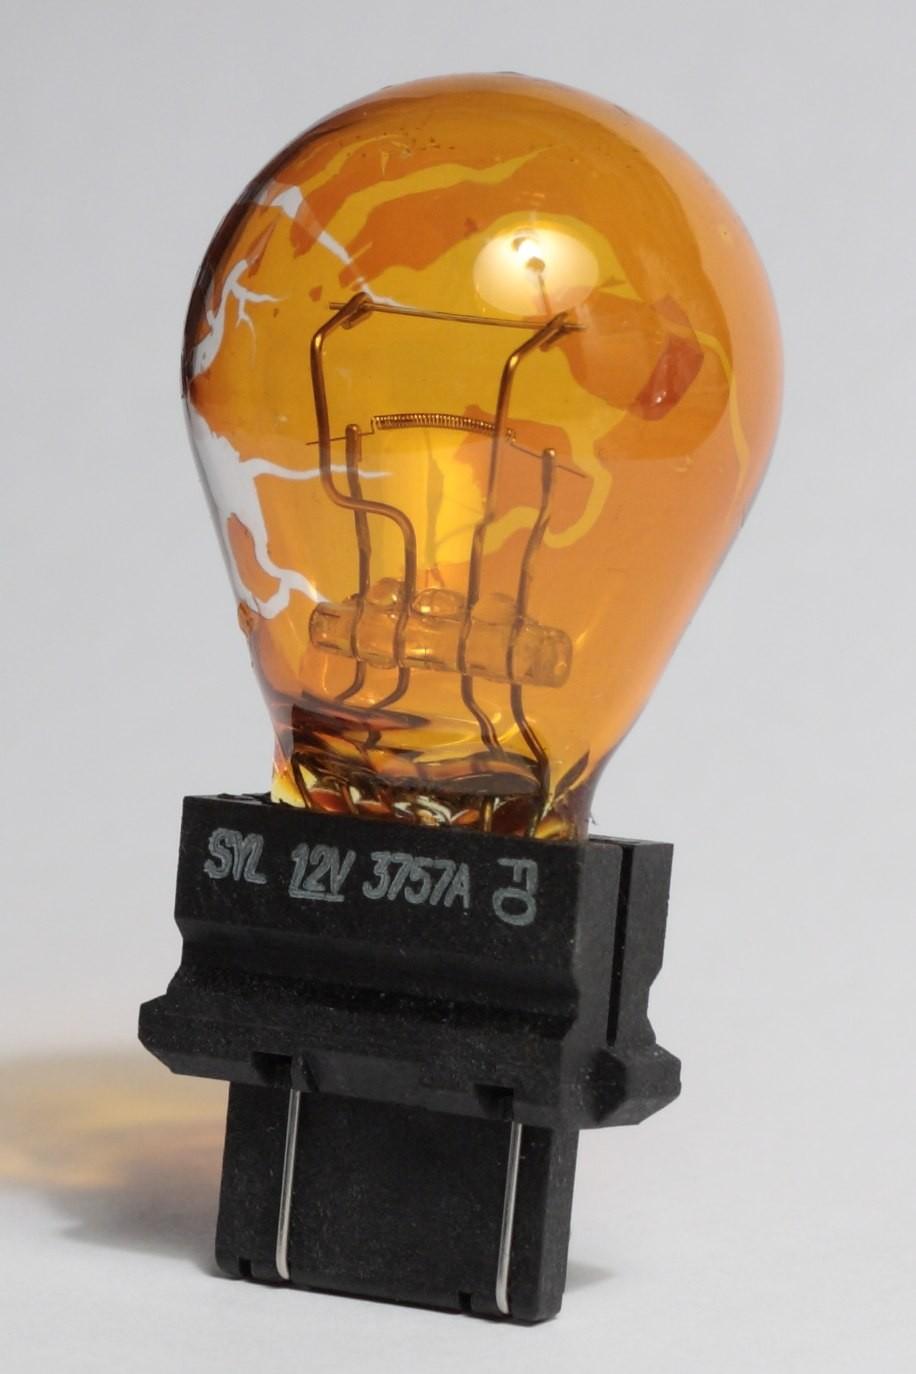 PY27 7W lamp used